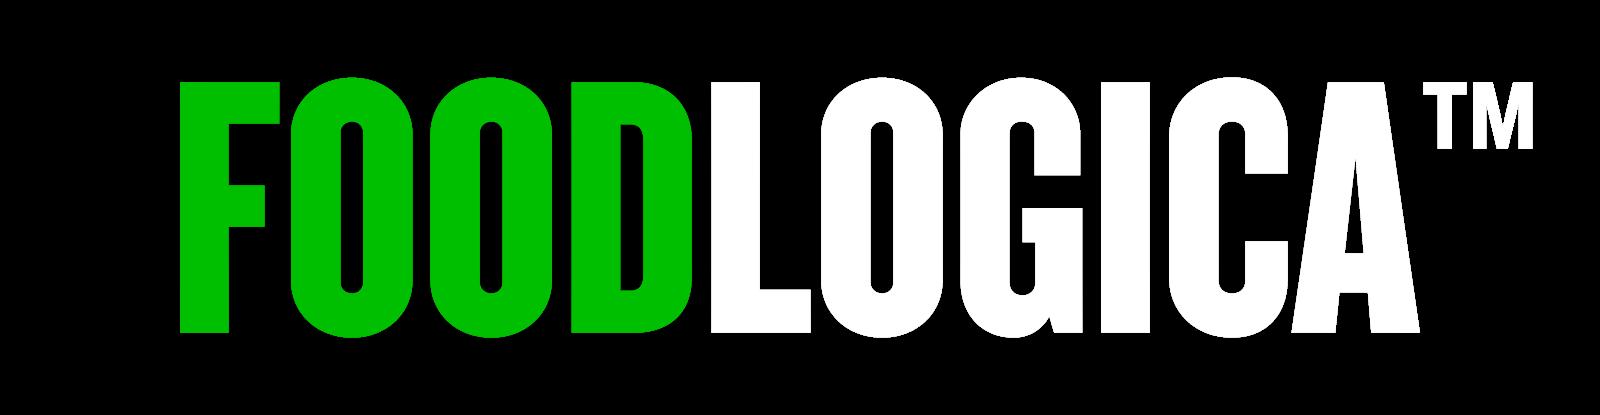 Foodlogica title logo